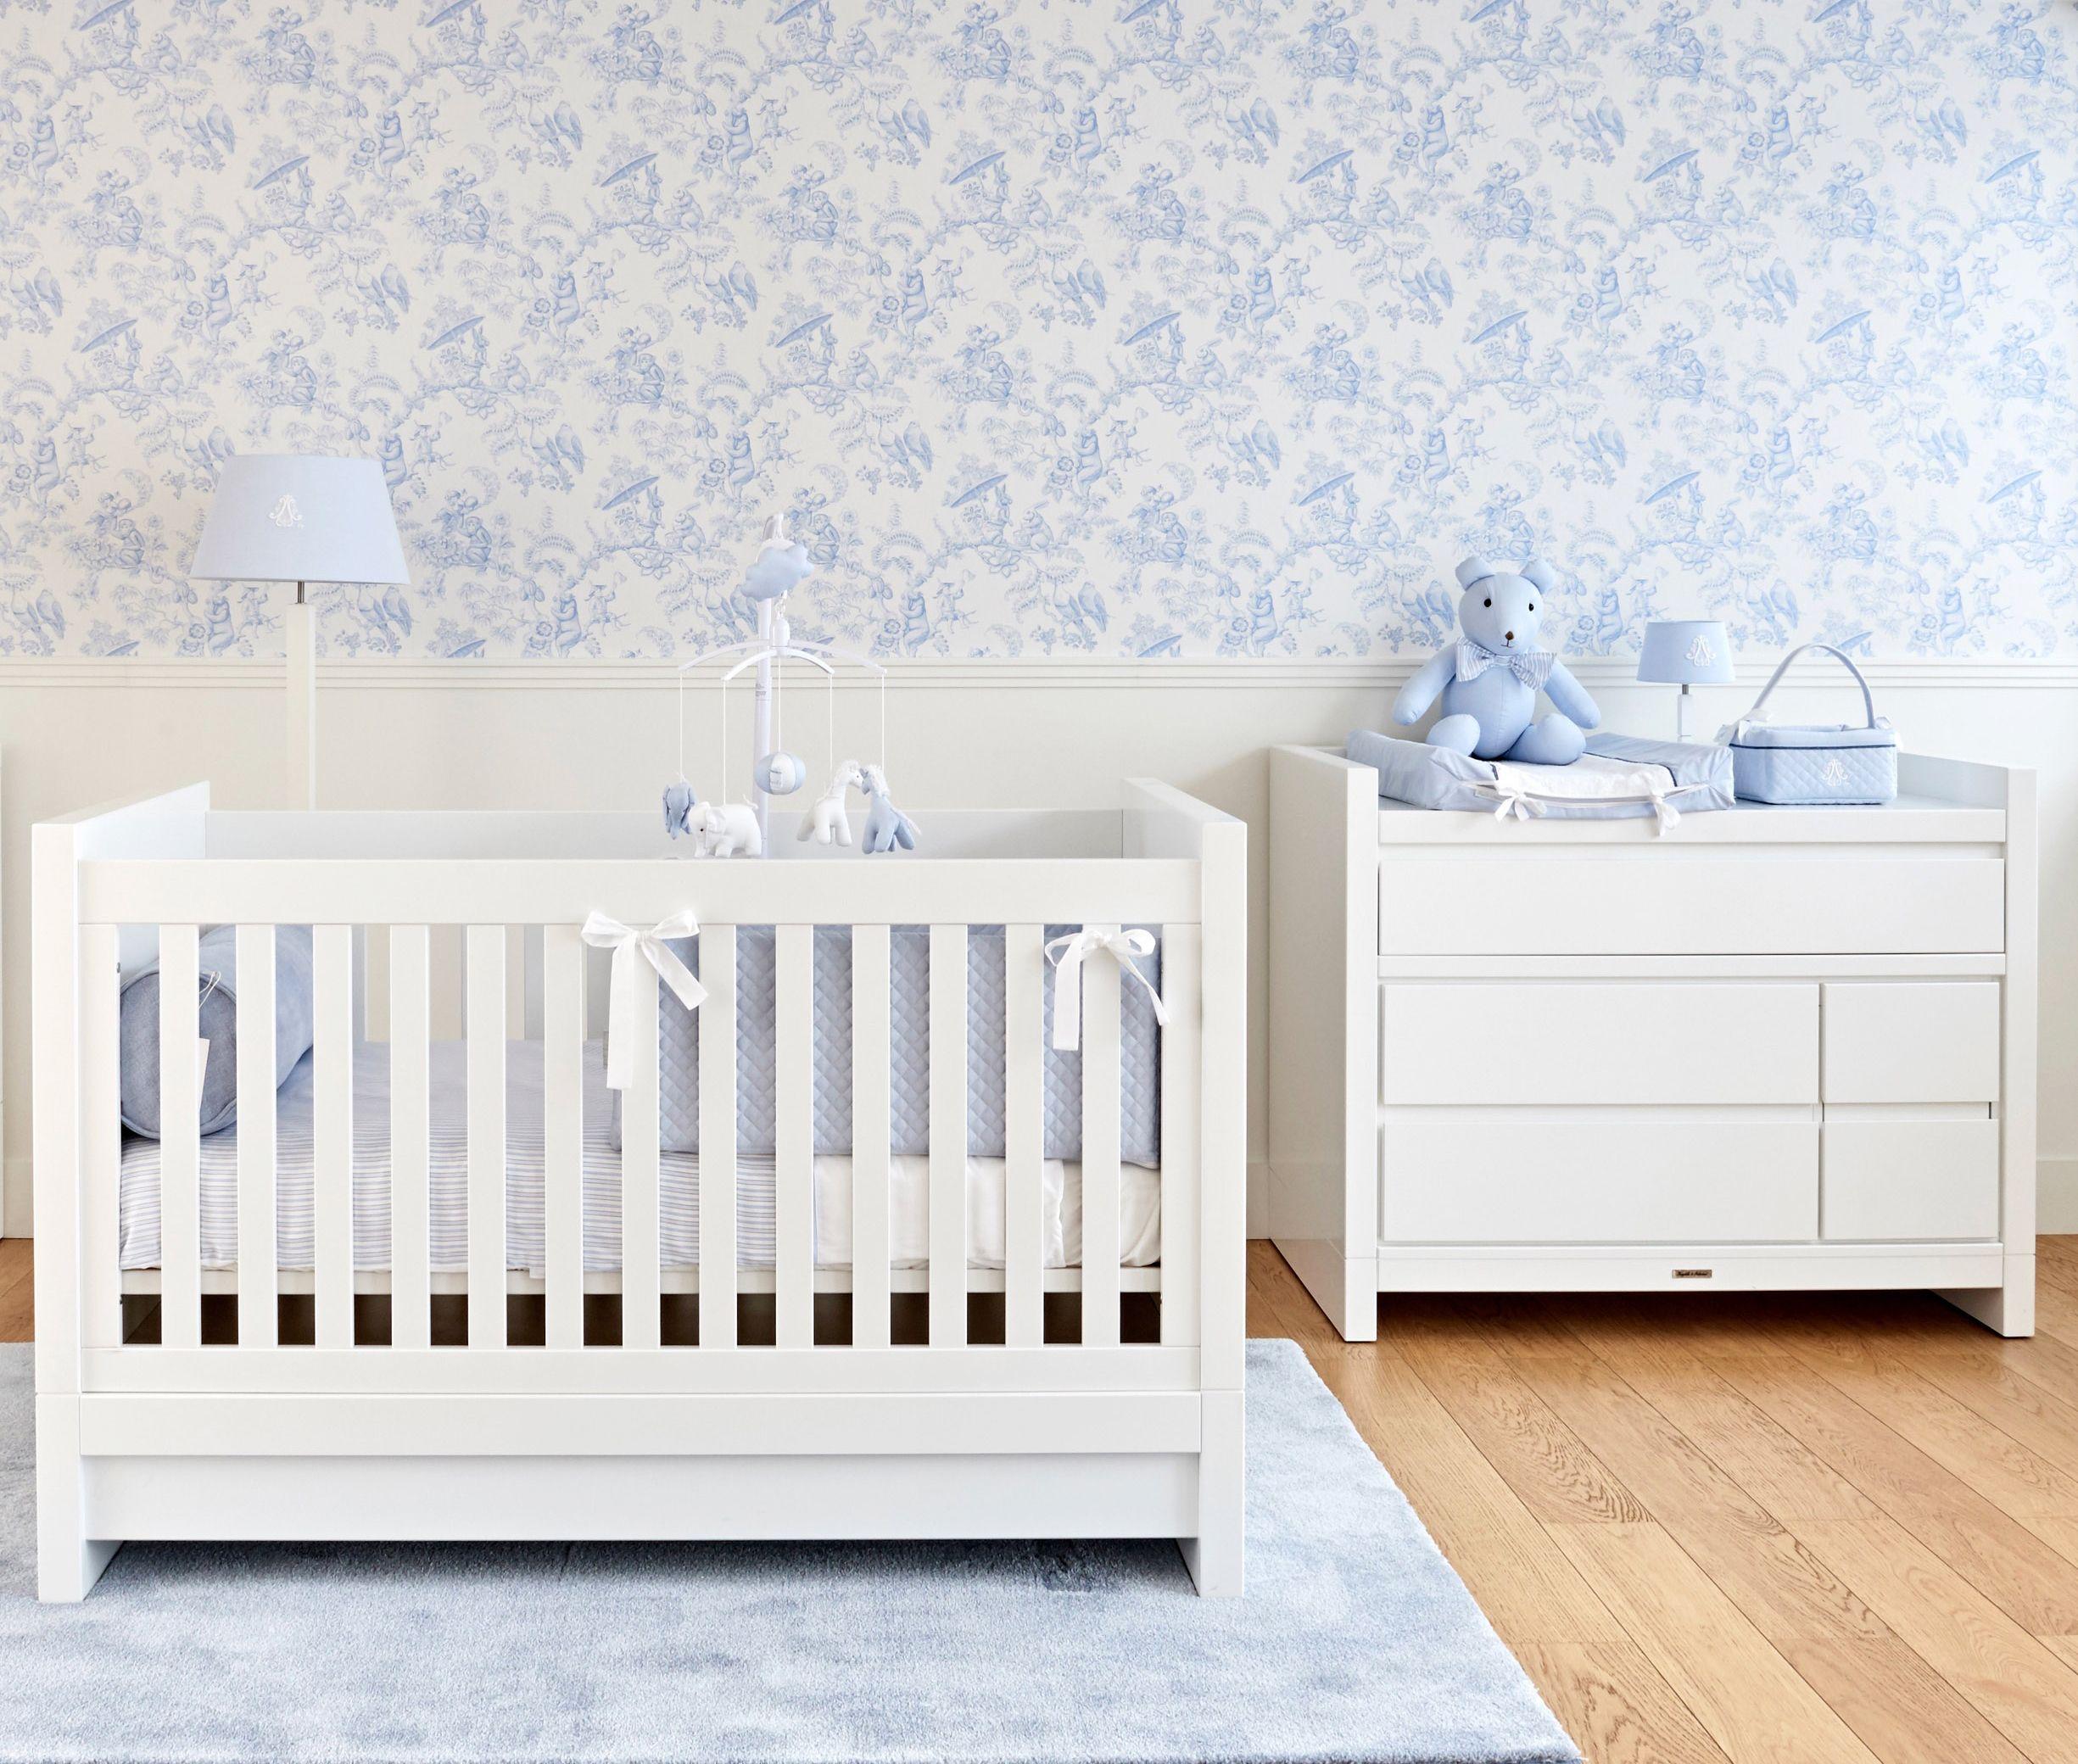 Prestige Babyroom Theophile Patachou Prestige Furniture And